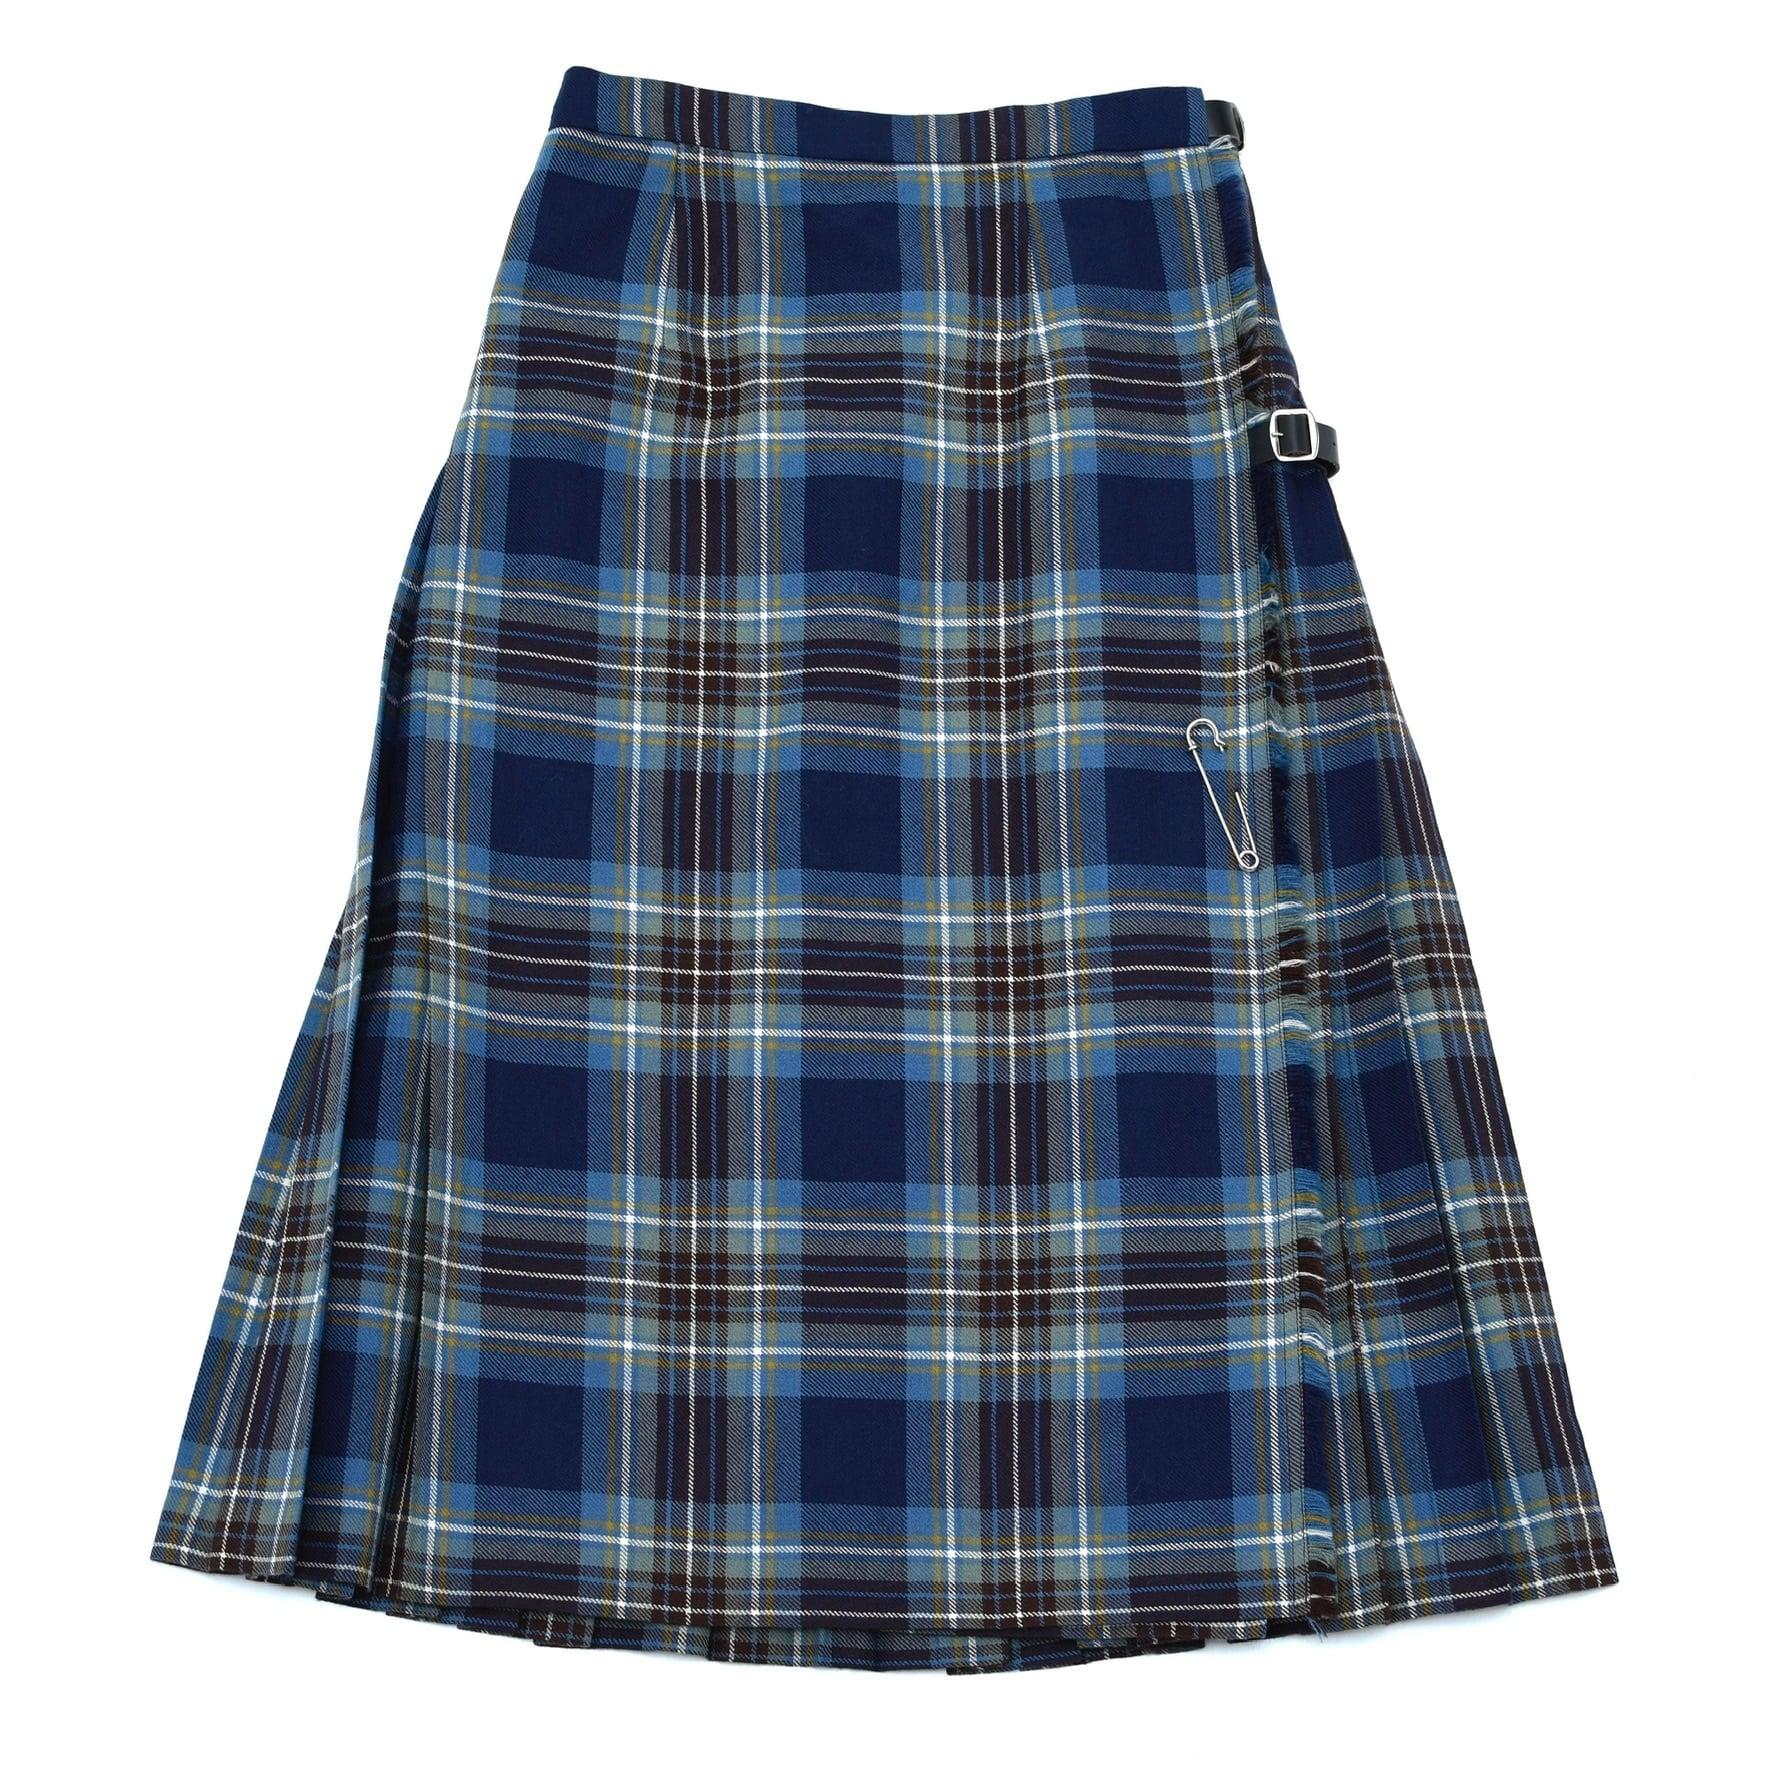 LOCHCARRON tartan check kilt skirt